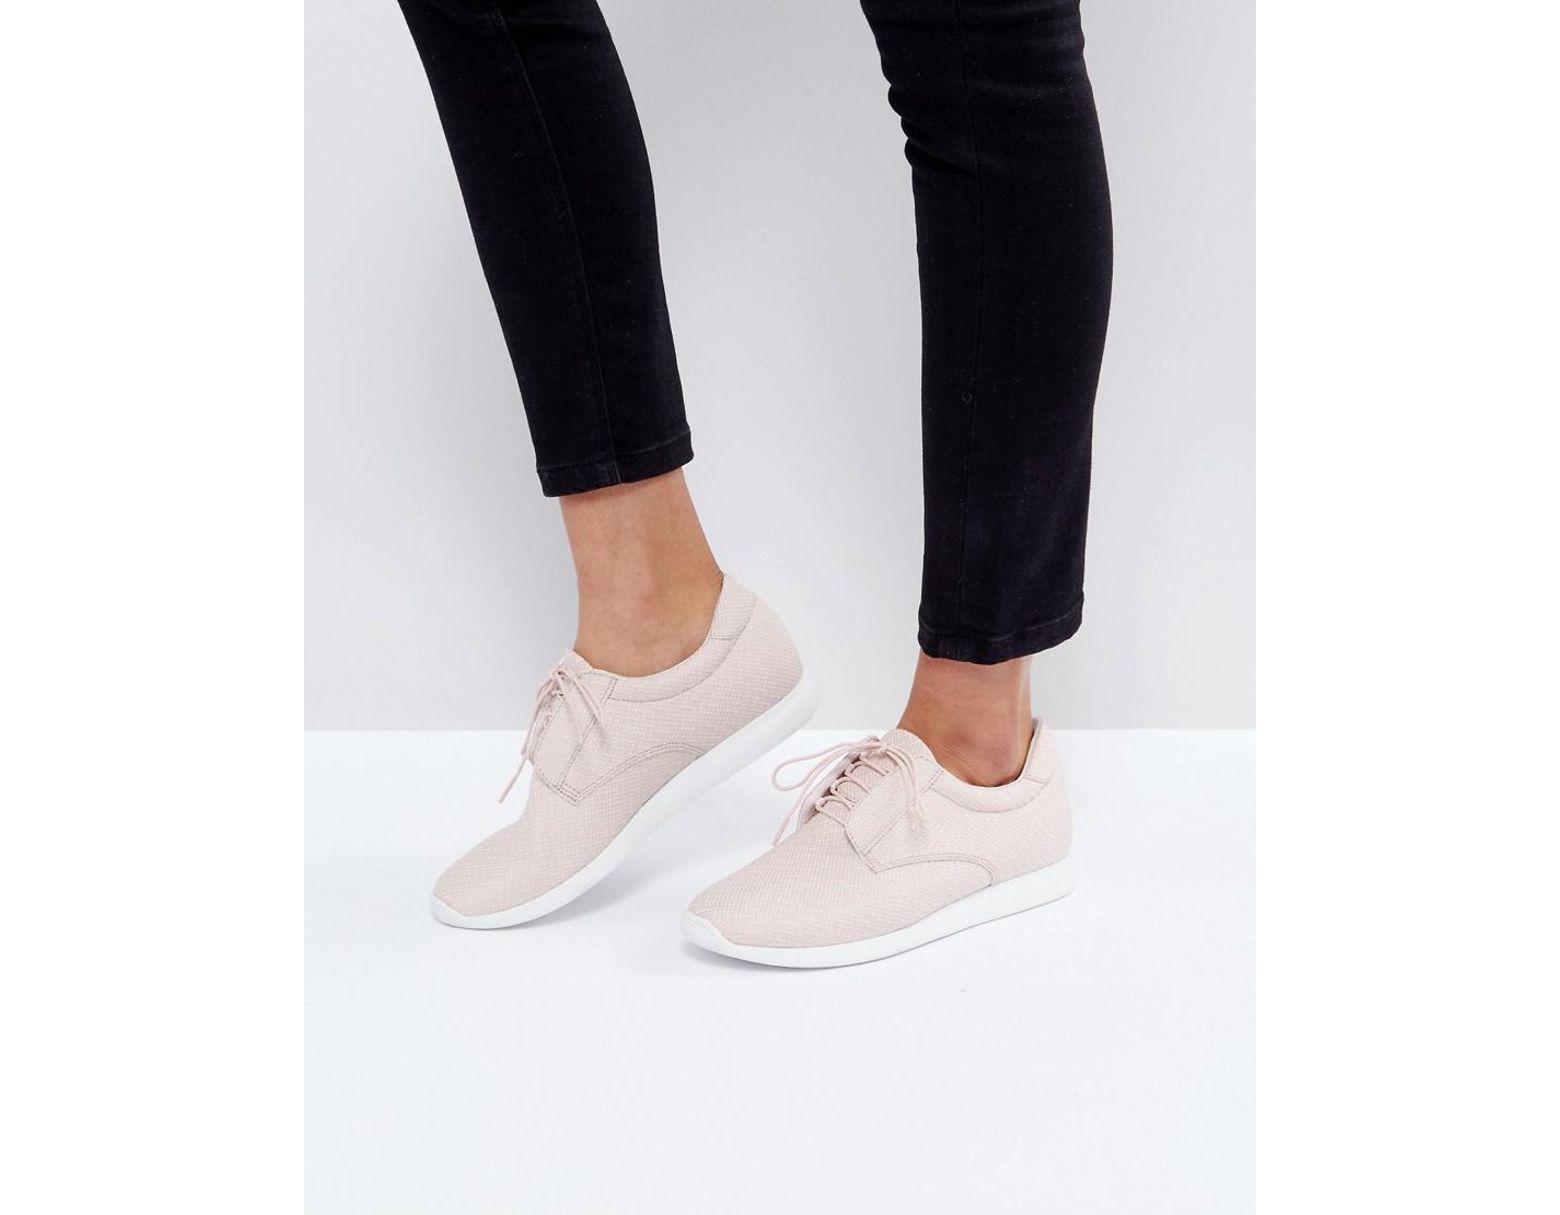 12356f93c8b796 Lyst - Vagabond Kasai Textile Sneaker In Pink in Pink